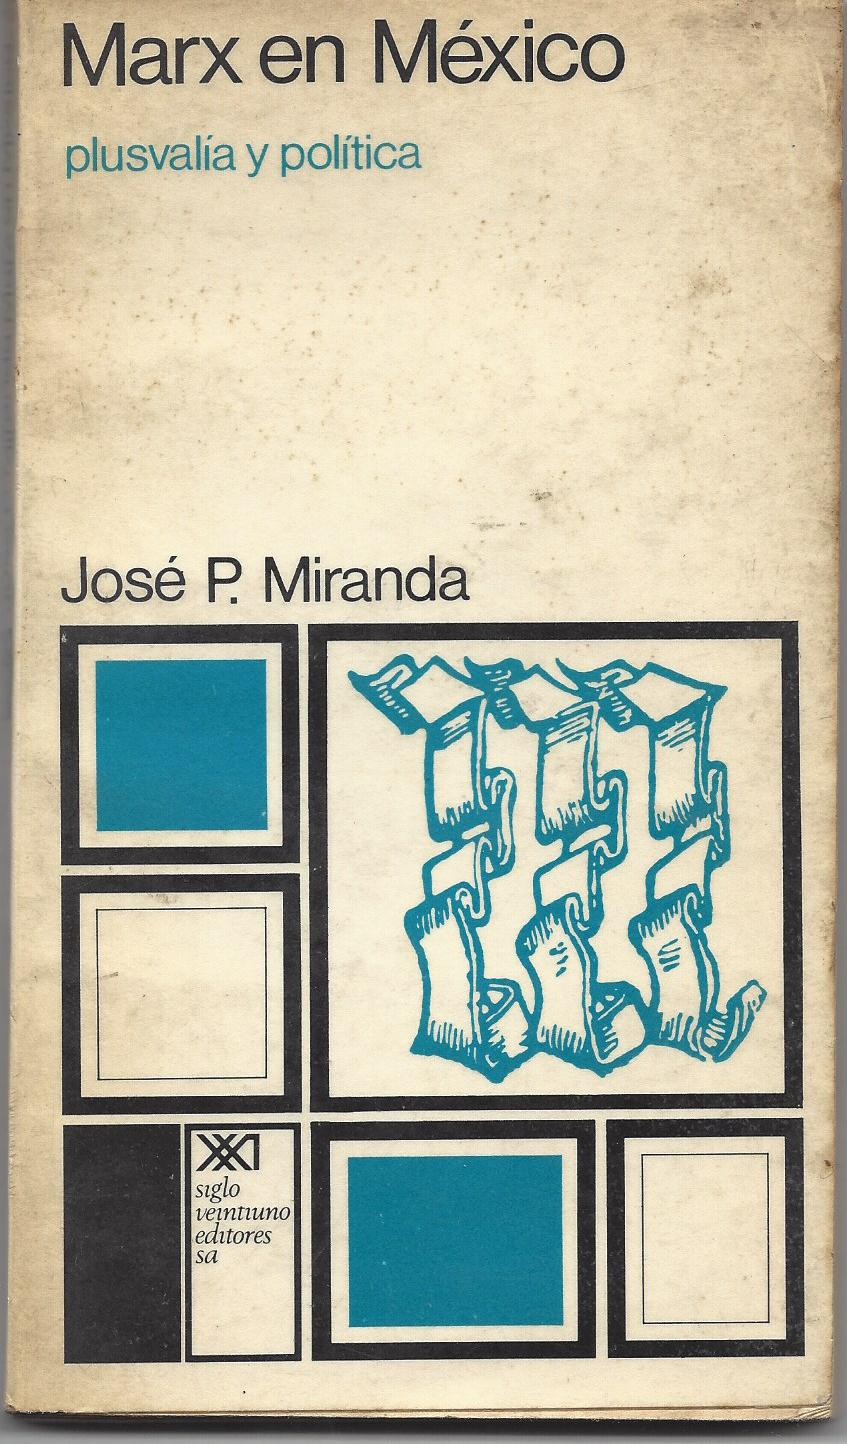 Marx en Mexico 1da Edici¢n